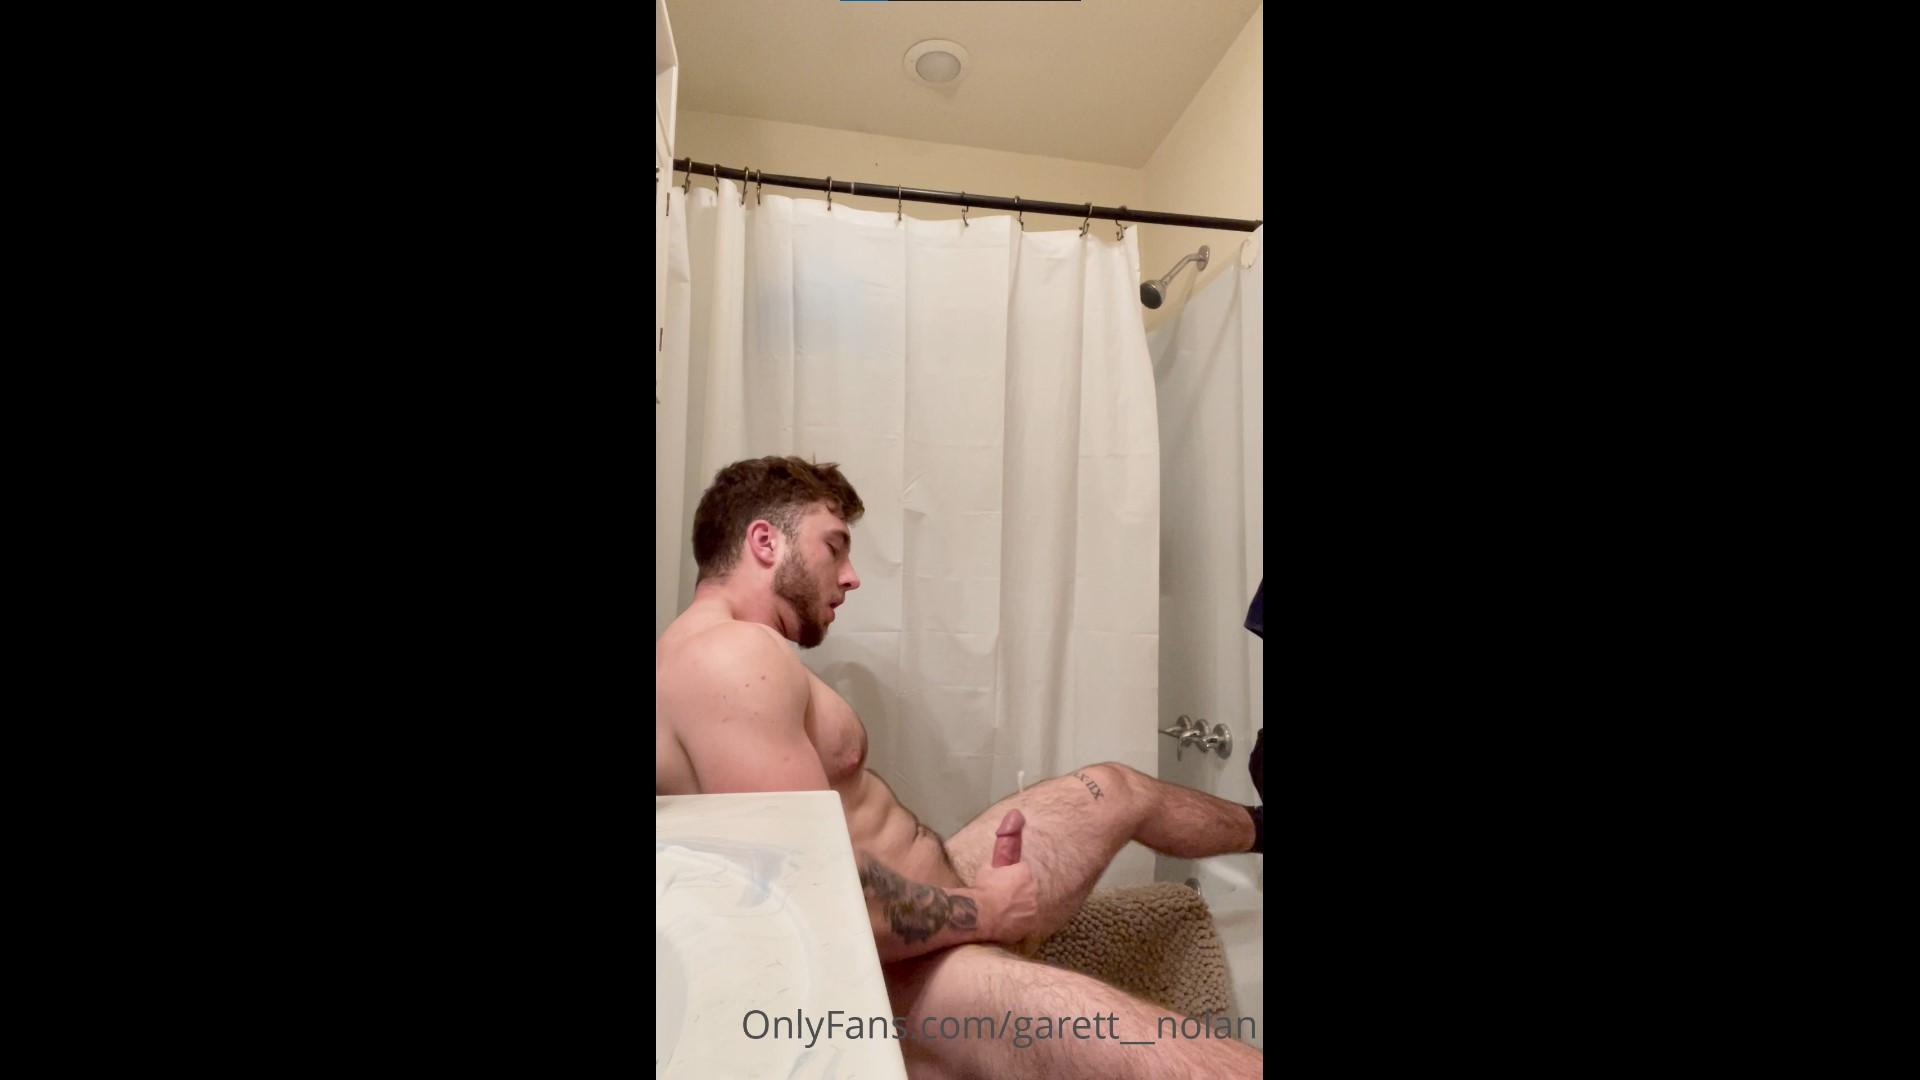 Jerking off hard in the bathroom and shooting my load - Garett Nolan